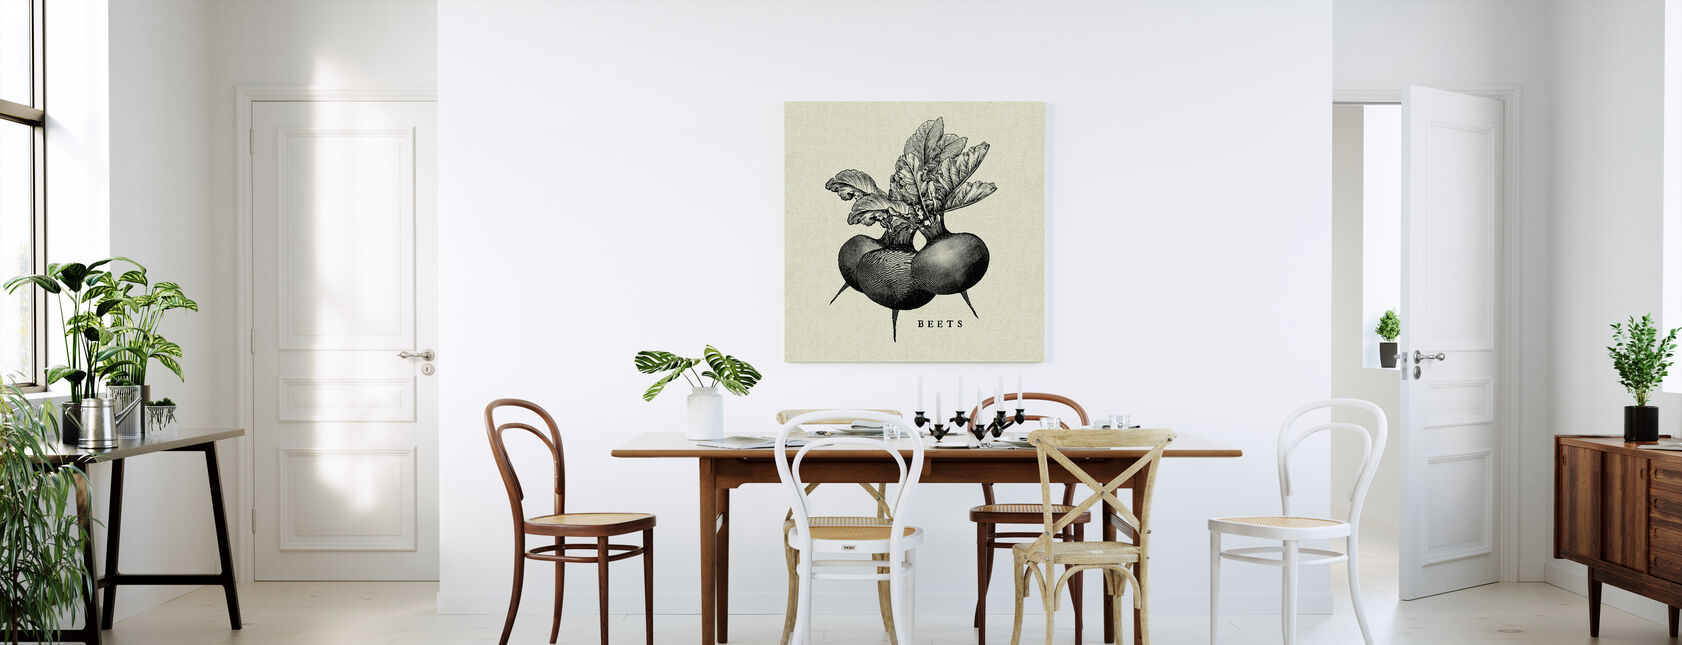 Ilustracja kuchenna - Buraki - Obraz na płótnie - Kuchnia